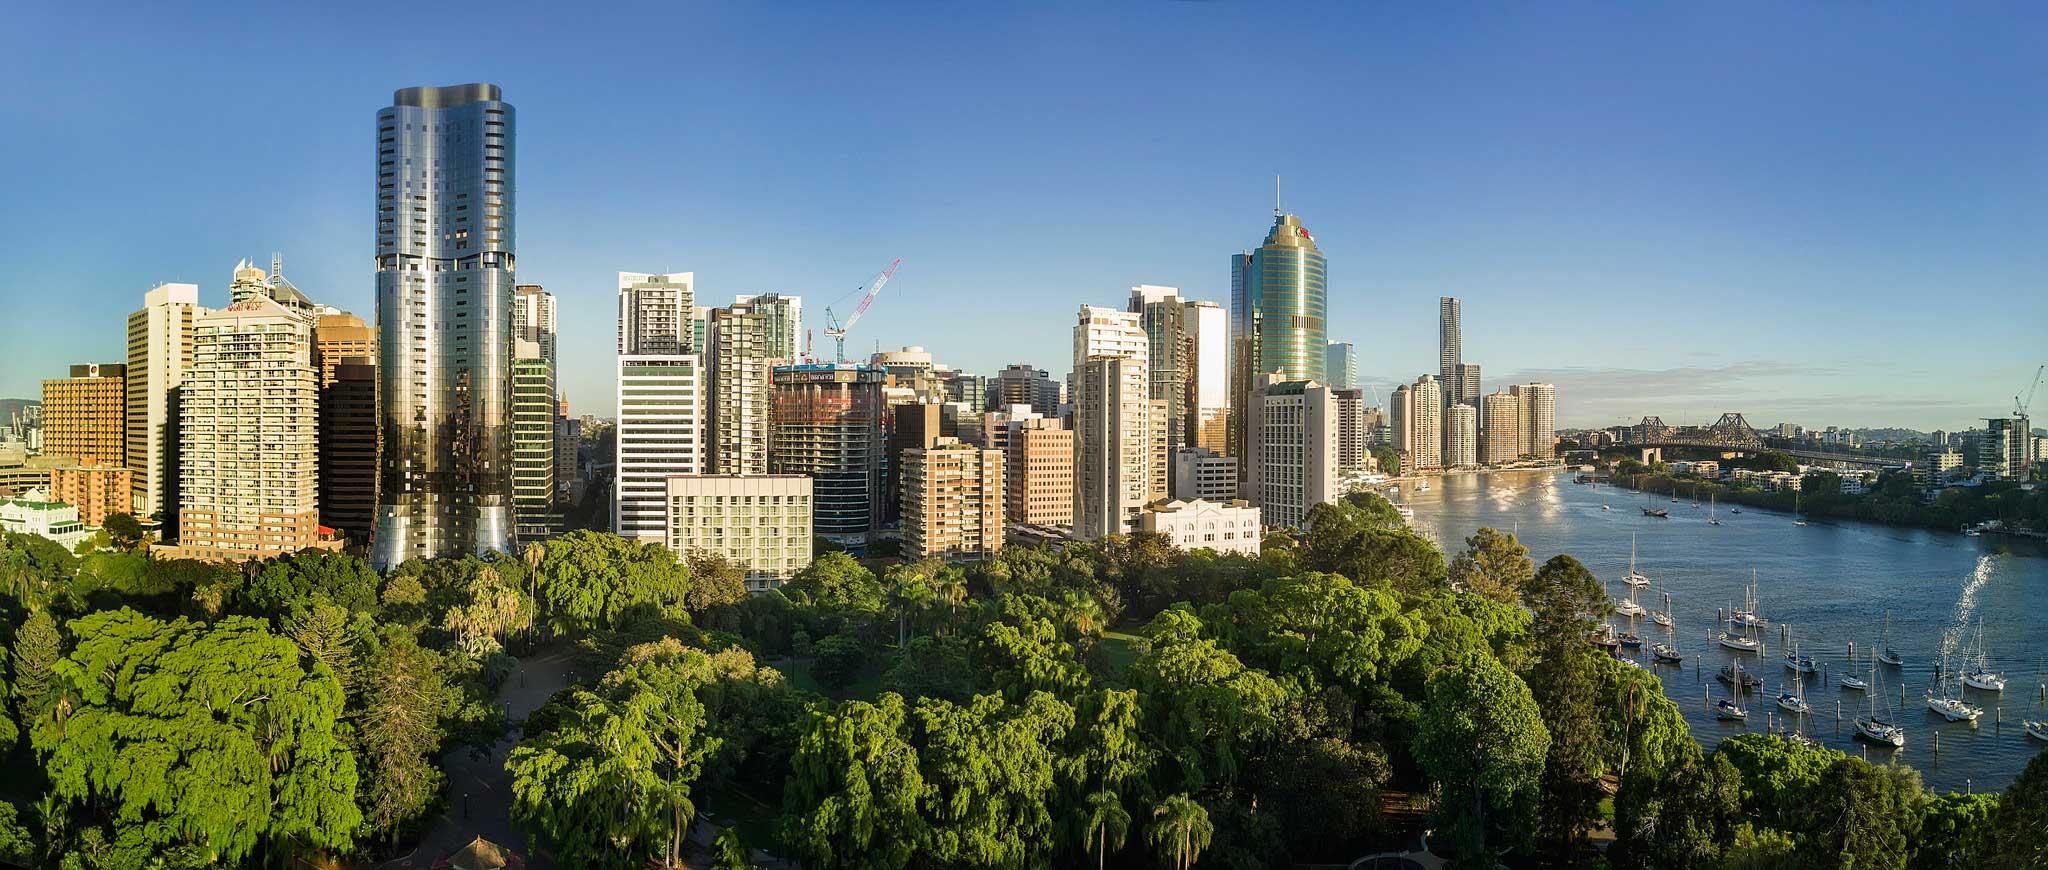 Brisbane City aerial panorama photograph Brisbane Botanic Gardens DroneAce